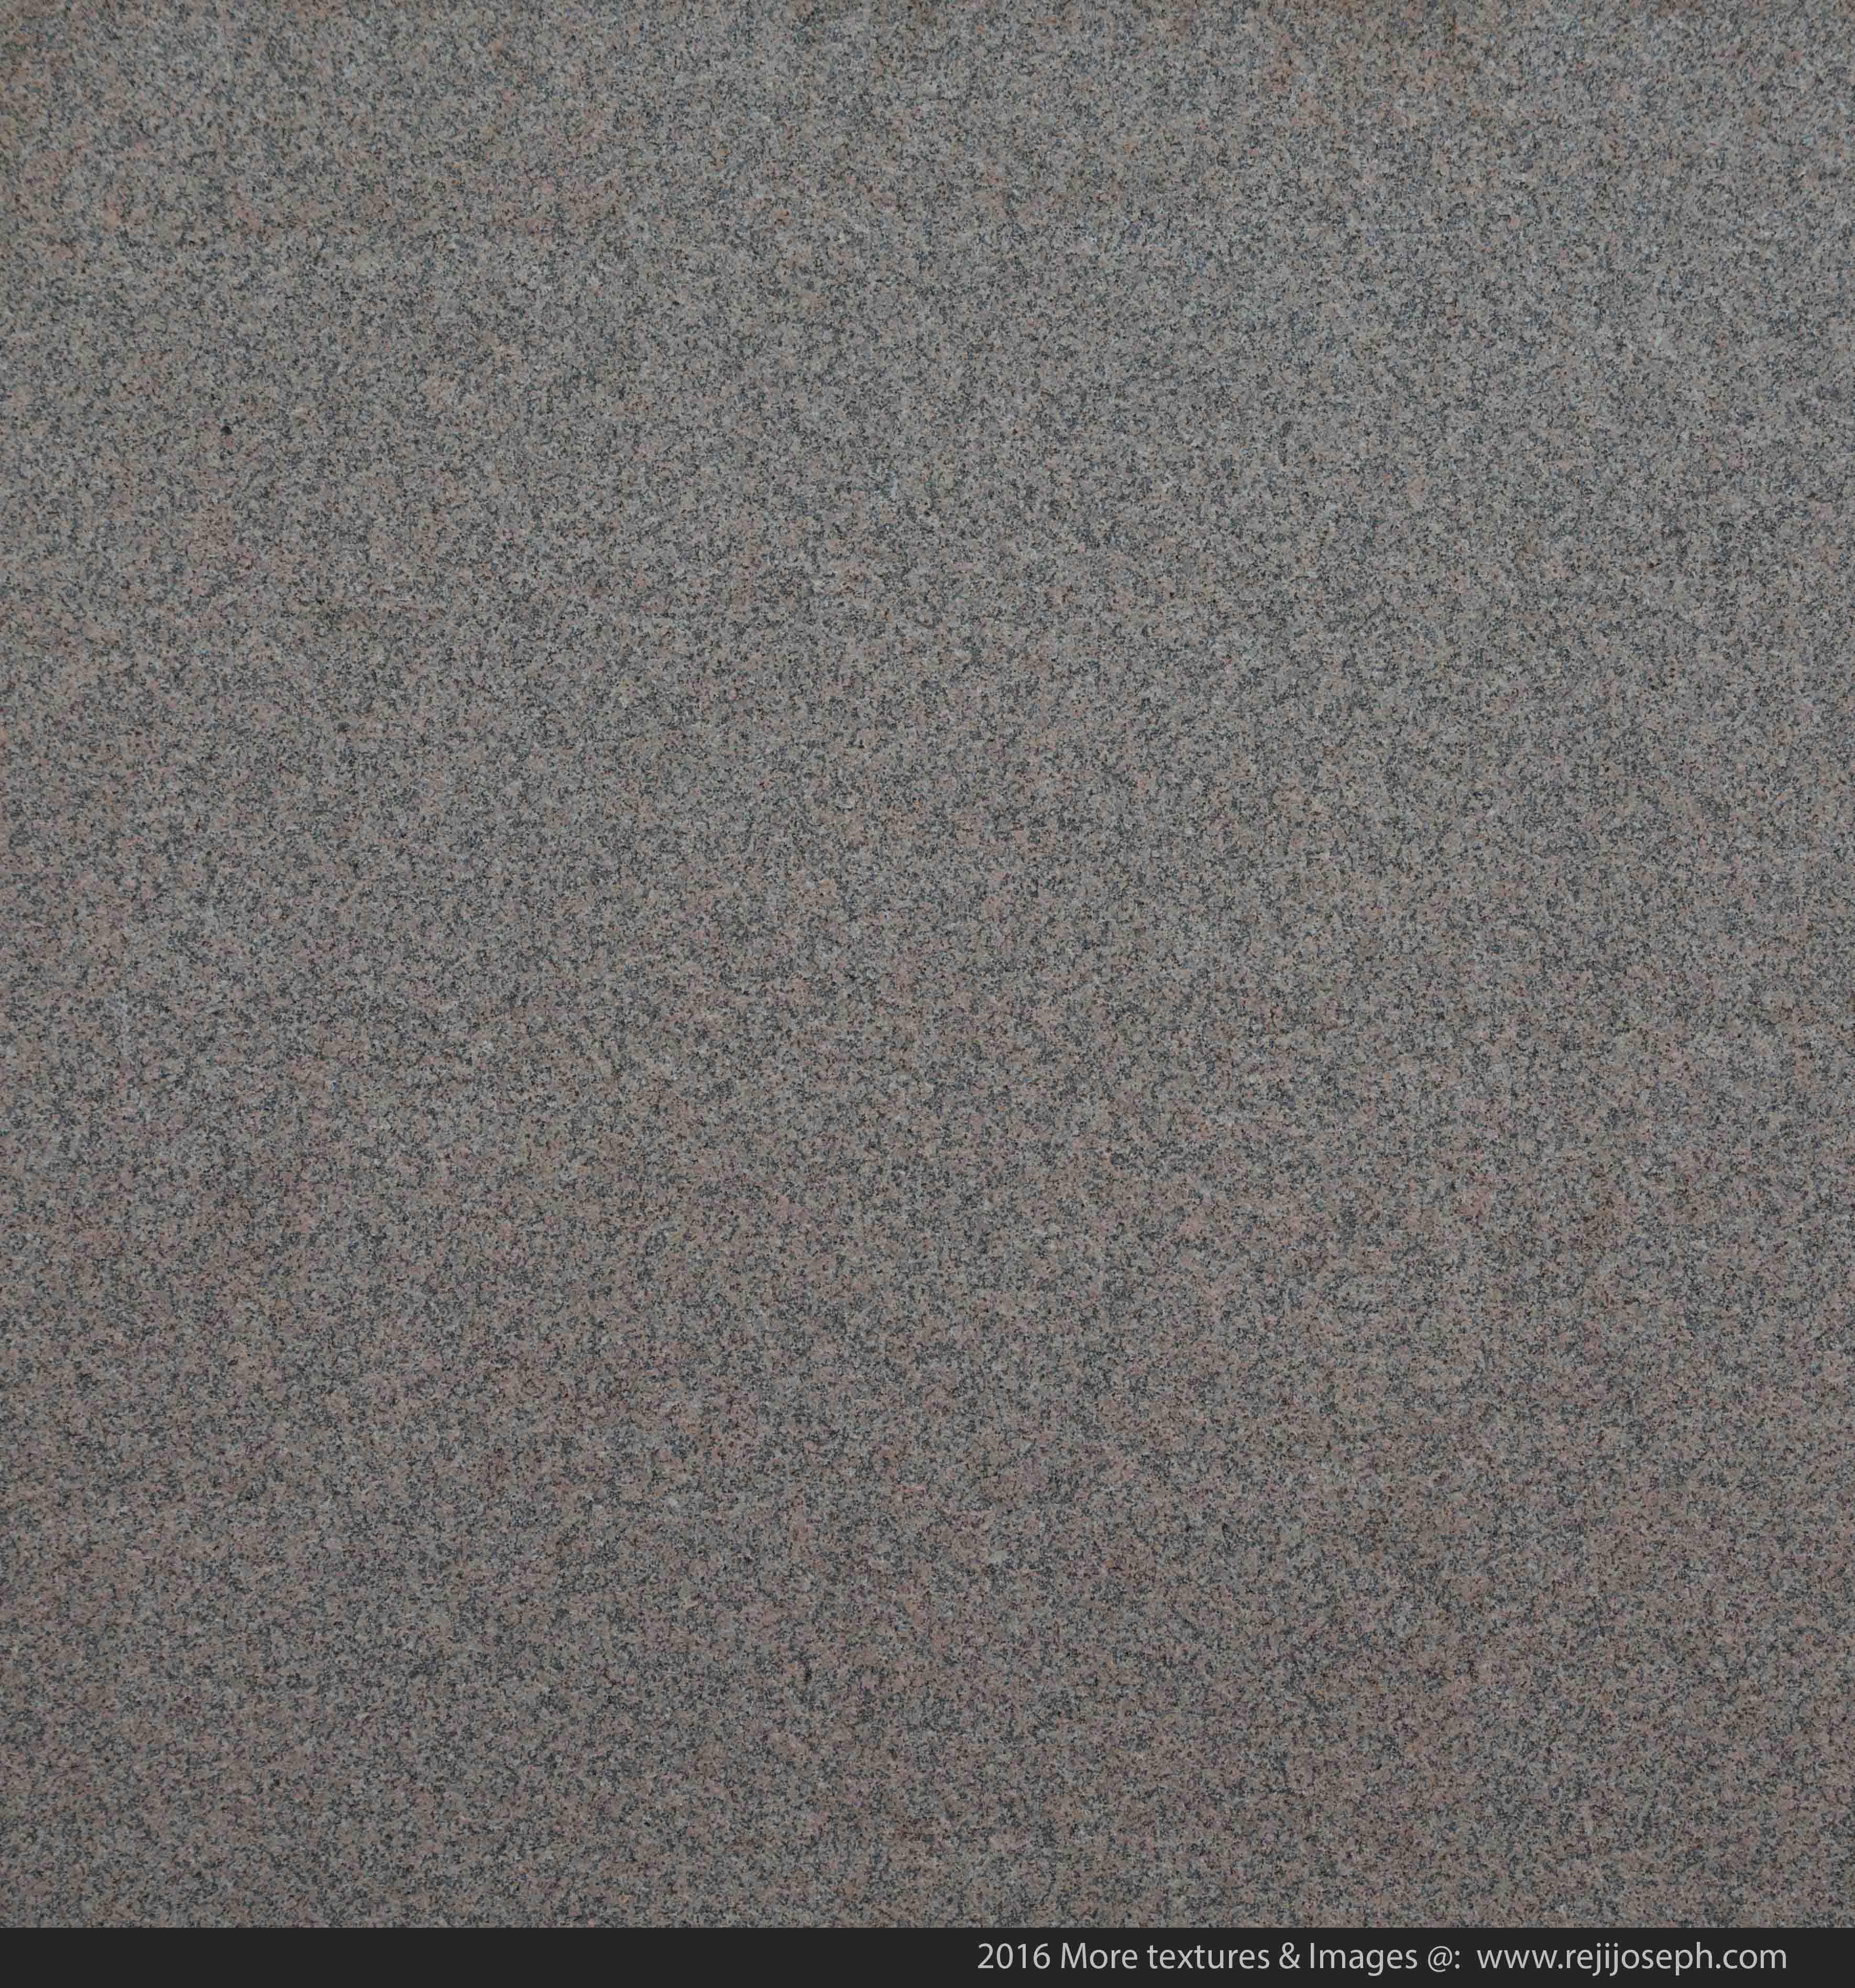 Gray-Marbles-Granites-Texture-00114